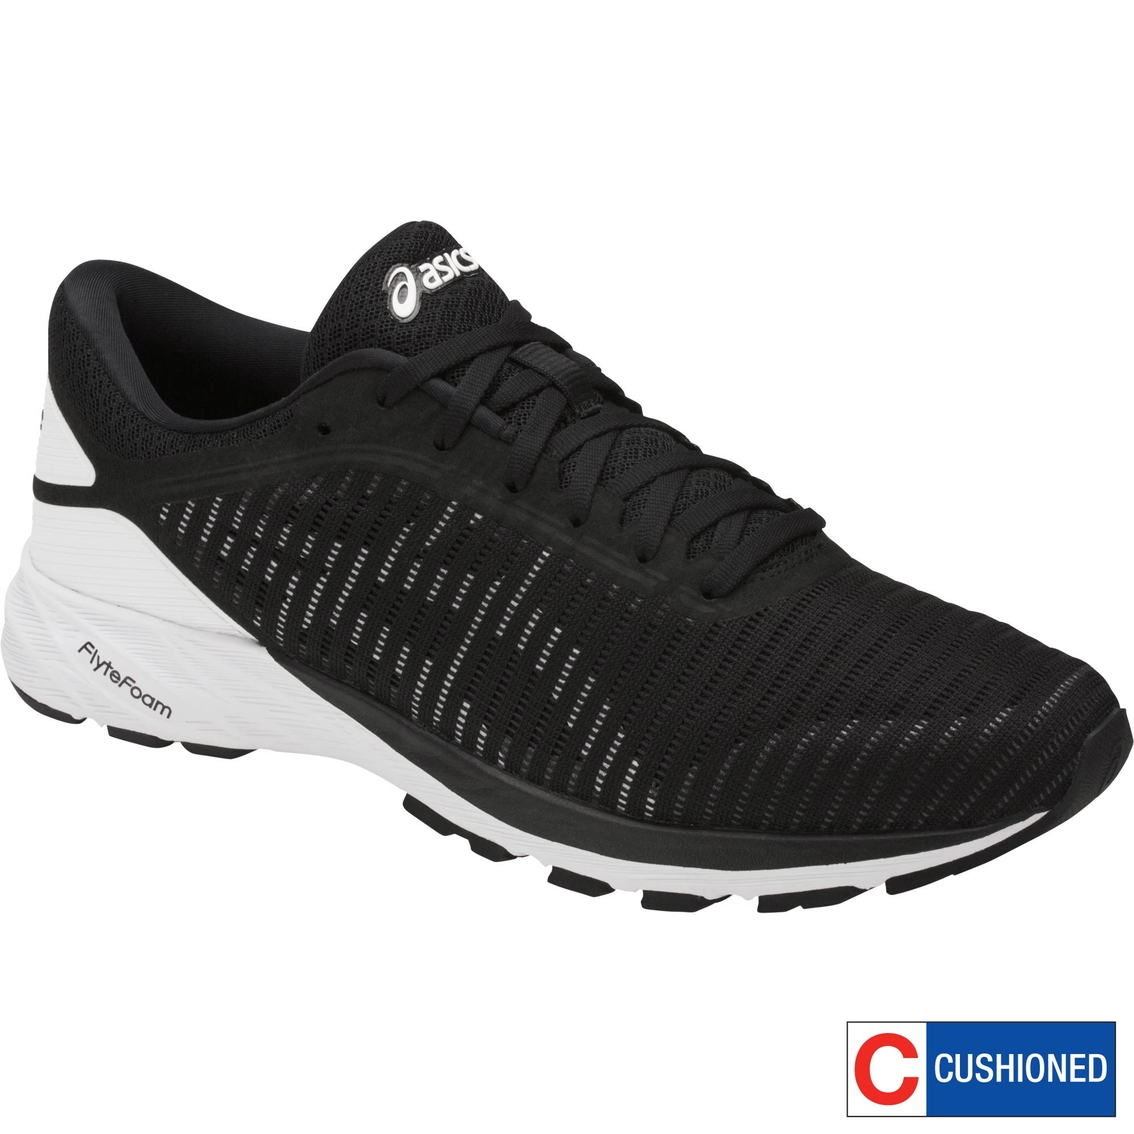 brand new 51d53 5cde7 Asics Men's Dynaflyte 2 Running Shoes | Running | Shoes ...